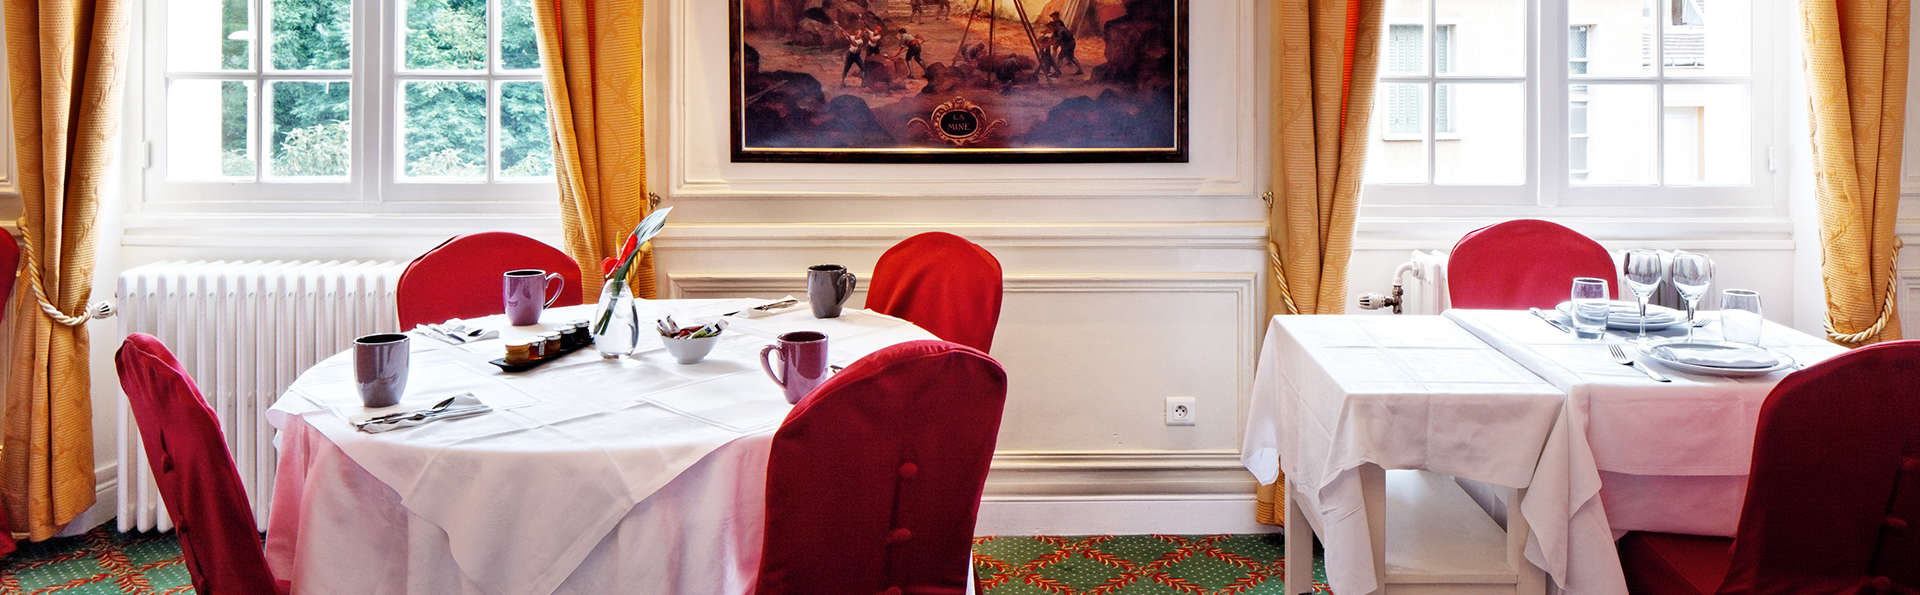 Hôtel La Petite Verrerie - EDIT_restaurant.jpg